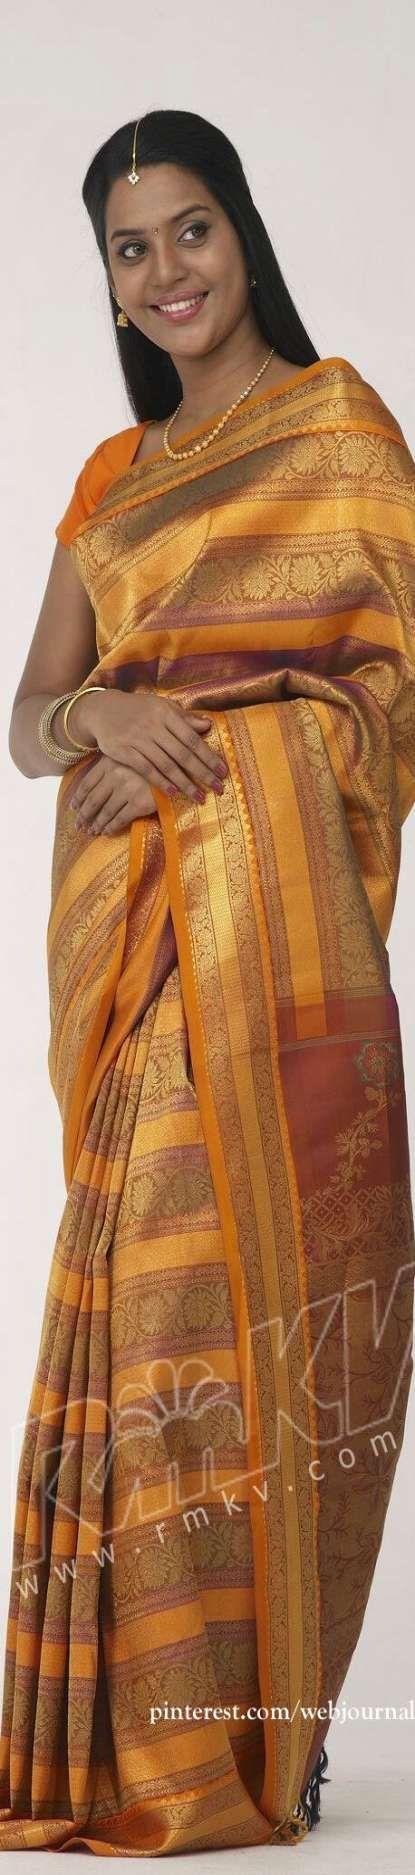 Trendy hindu bridal hairstyles saris 20+ Ideas